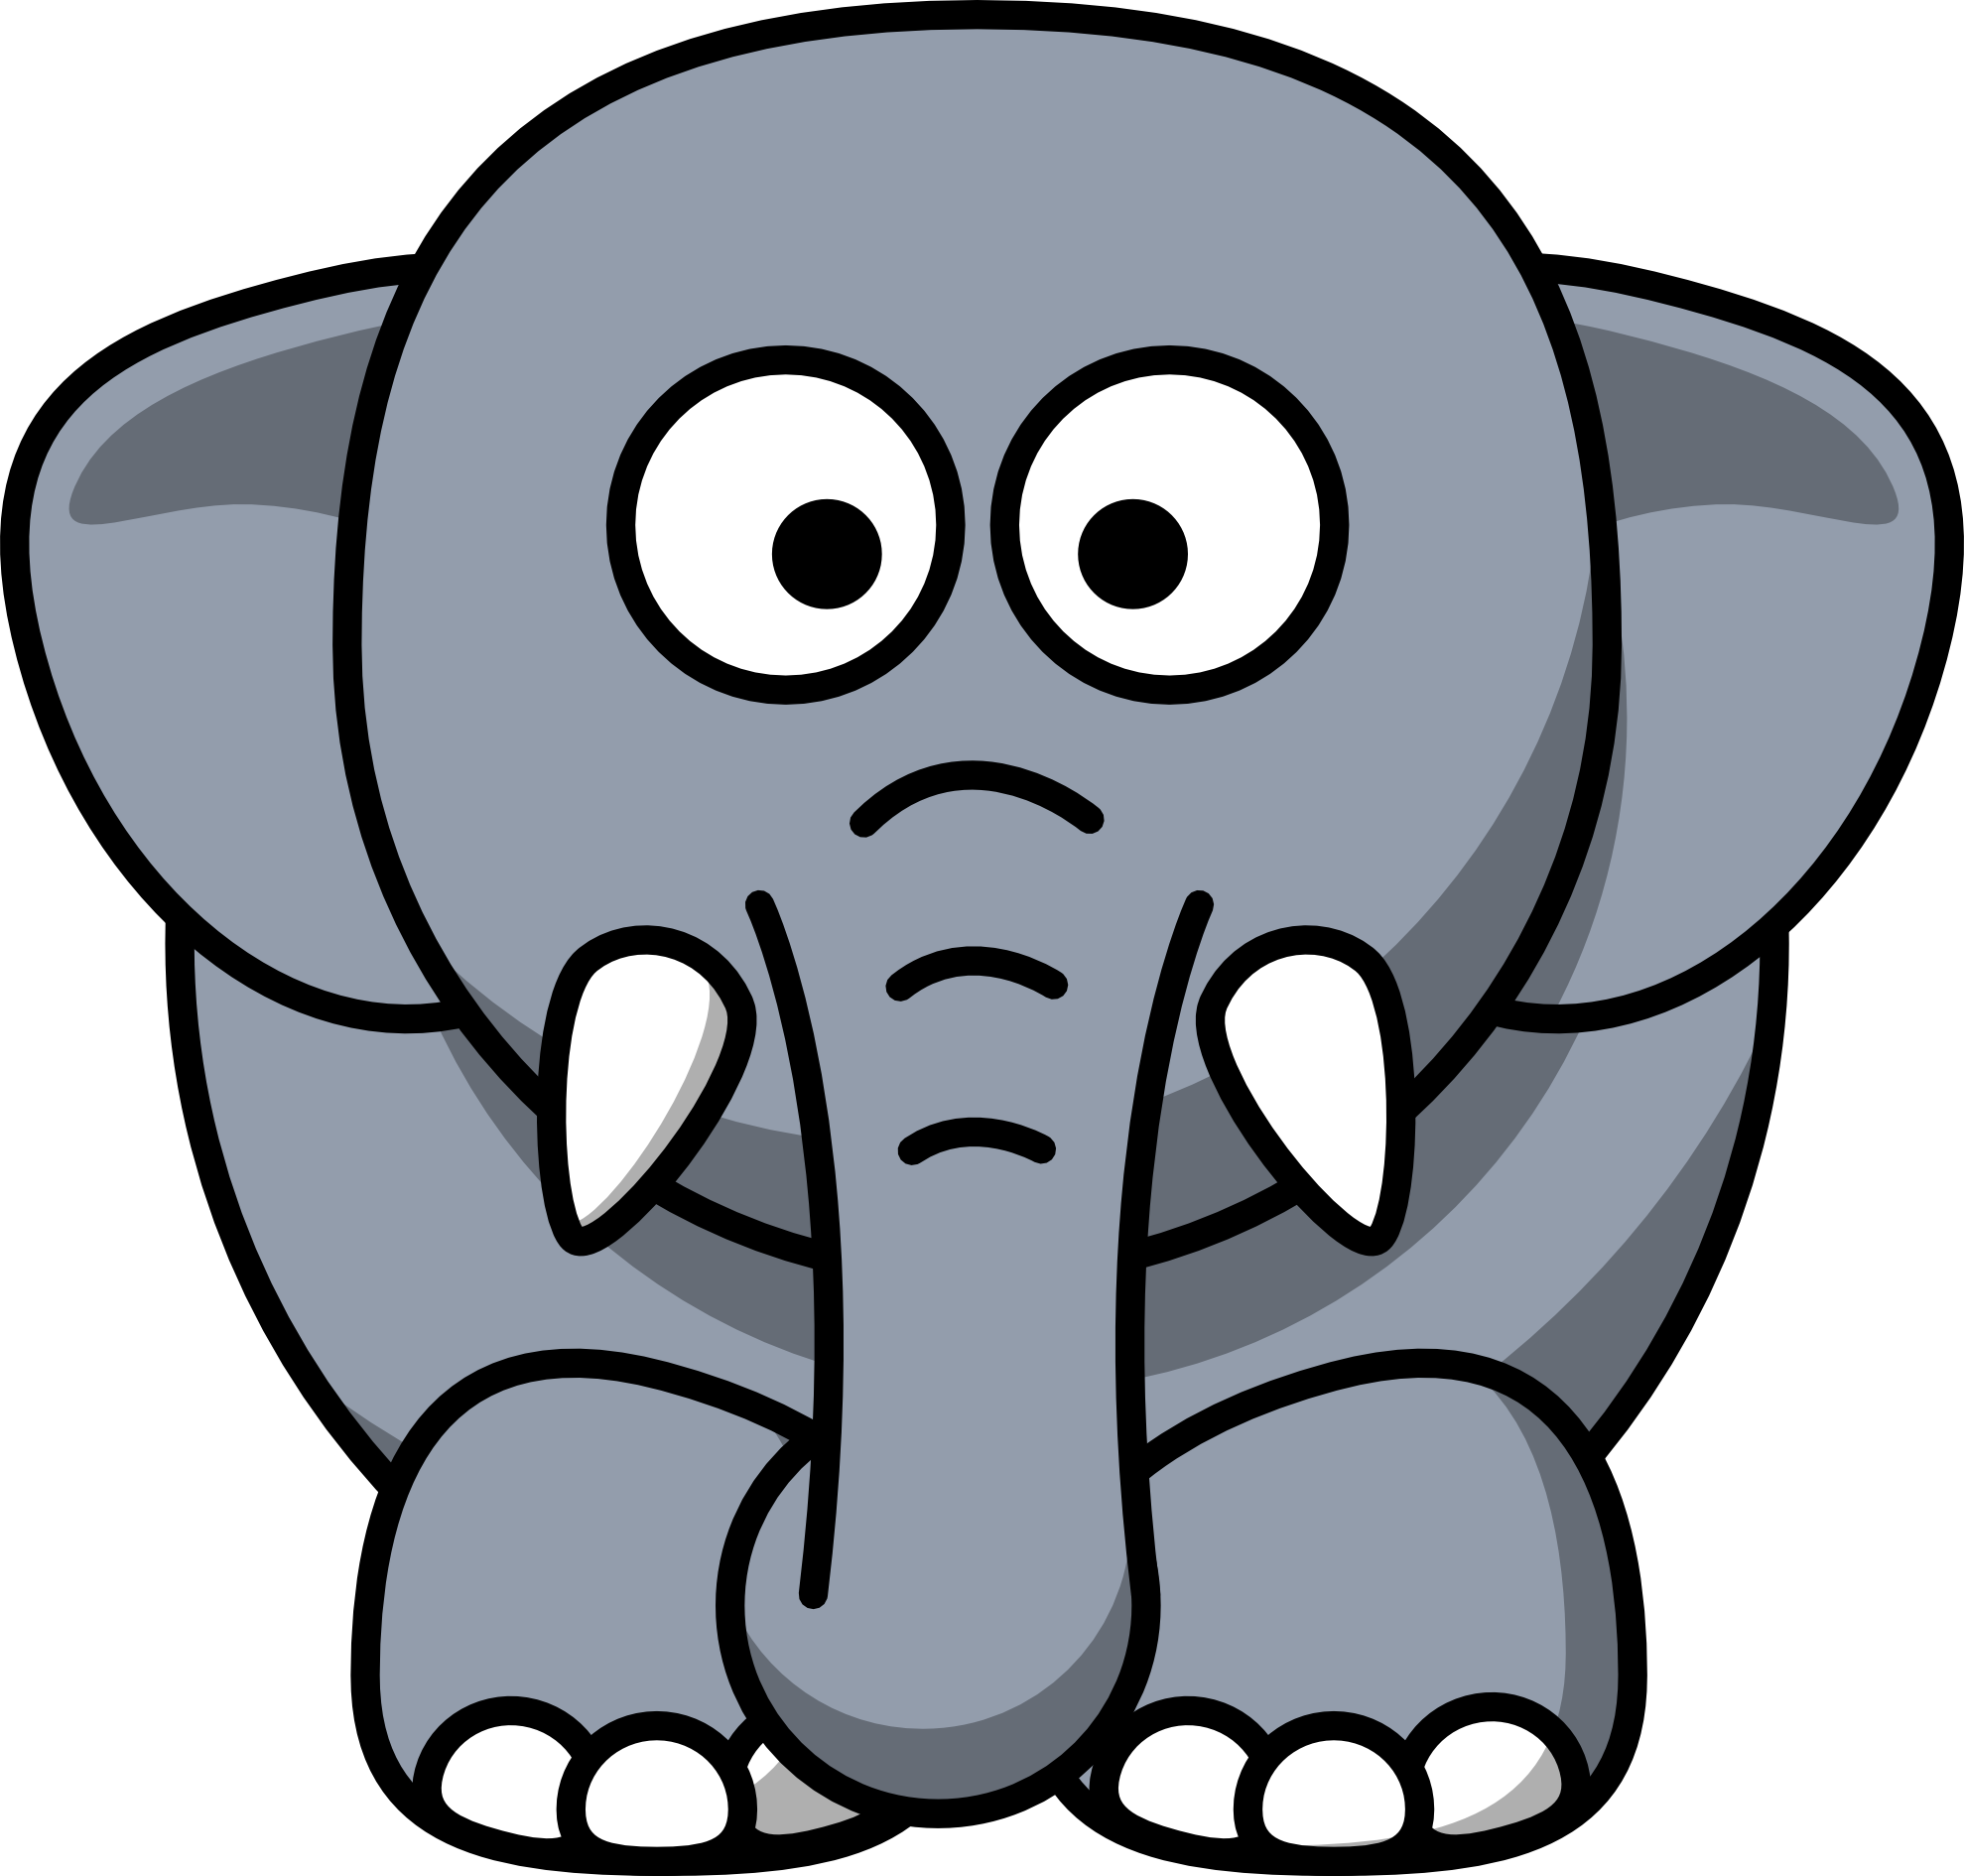 Baby Elephant Clipart Clipart Panda Free-Baby Elephant Clipart Clipart Panda Free Clipart Images-0